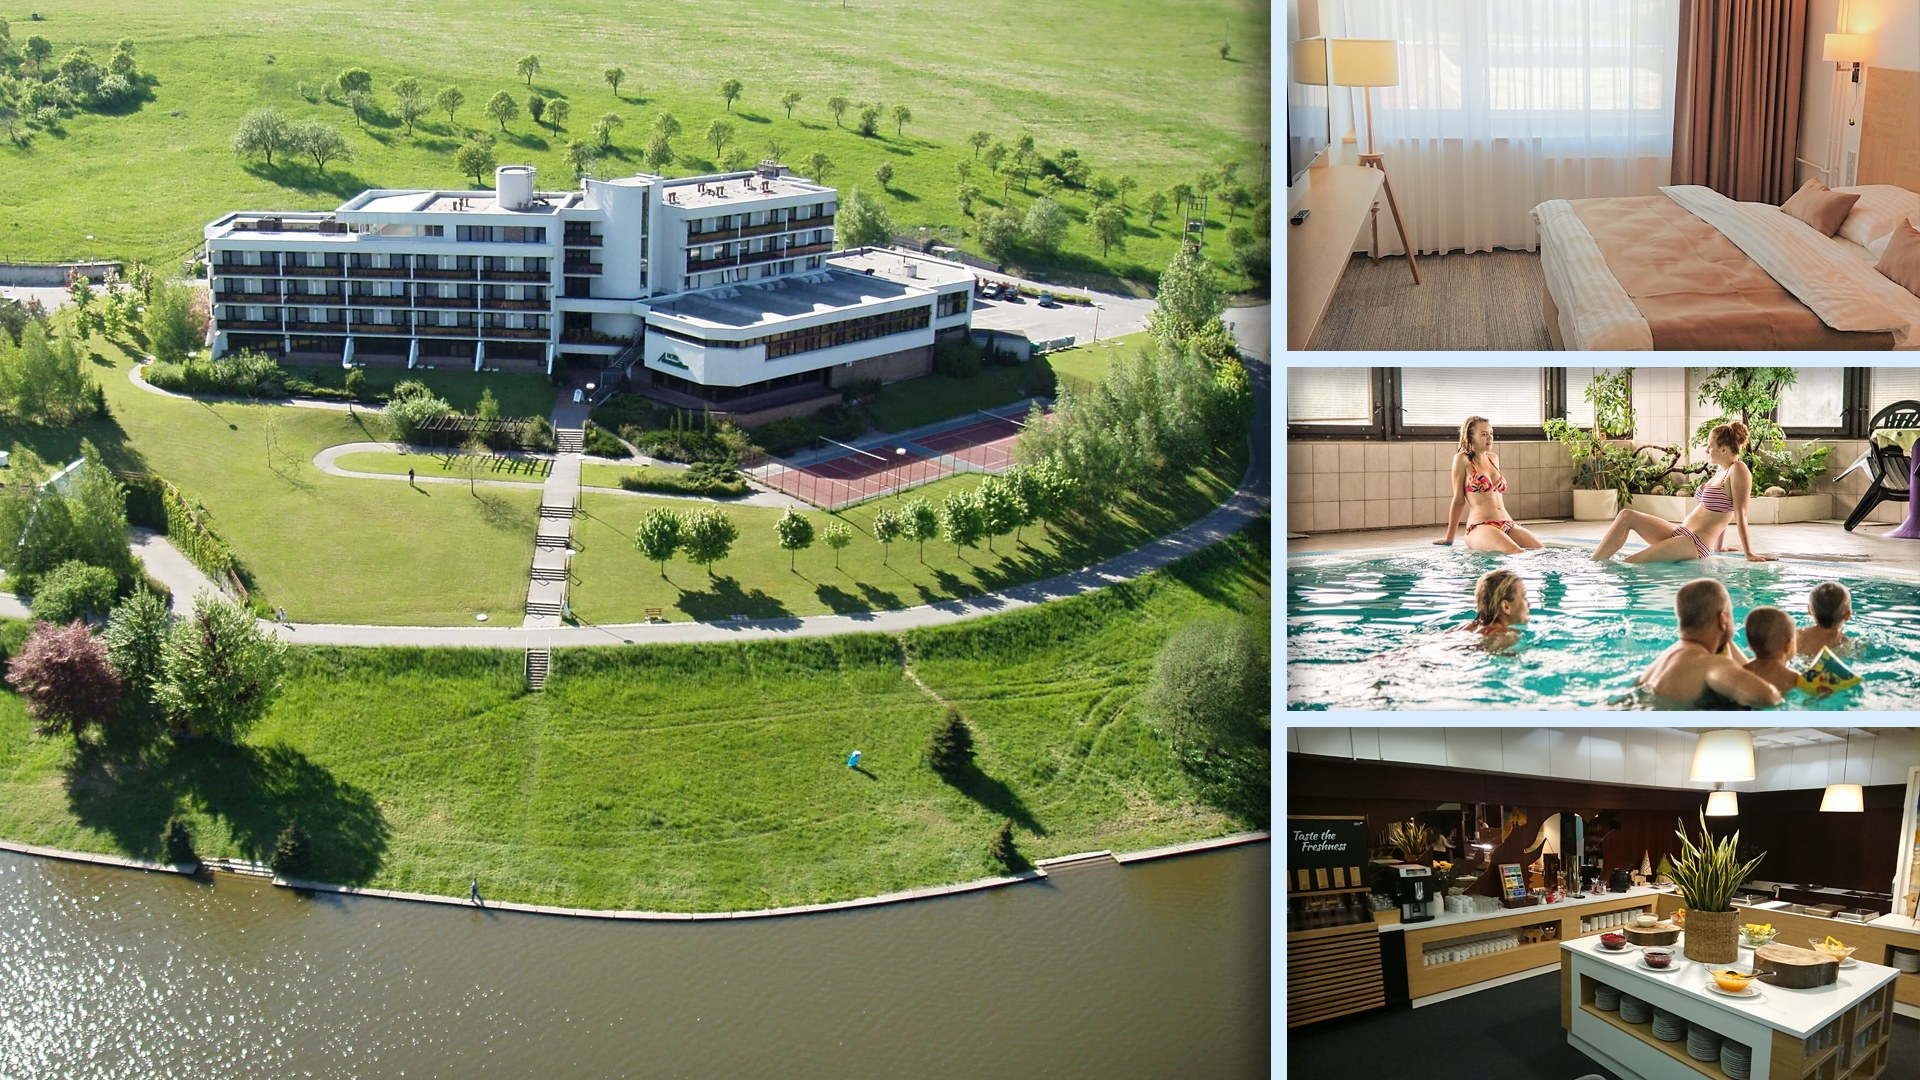 Hotel Adamantino - u Luhačovic s výhledem na hladinu